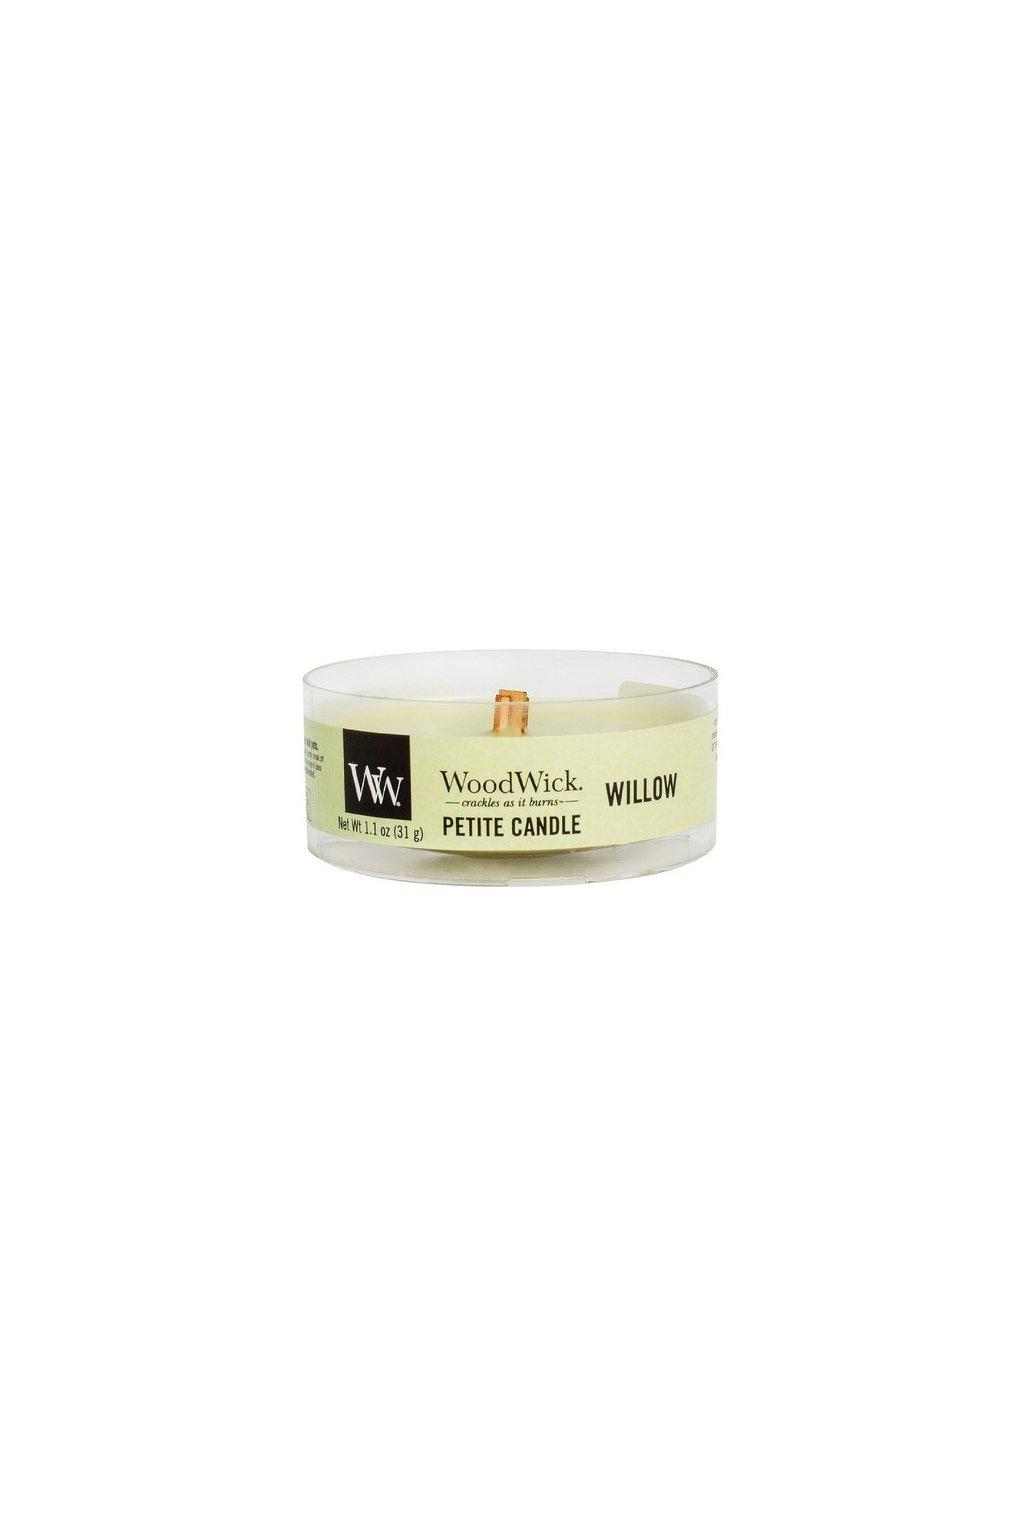 Woodwick Willow svíčka petite